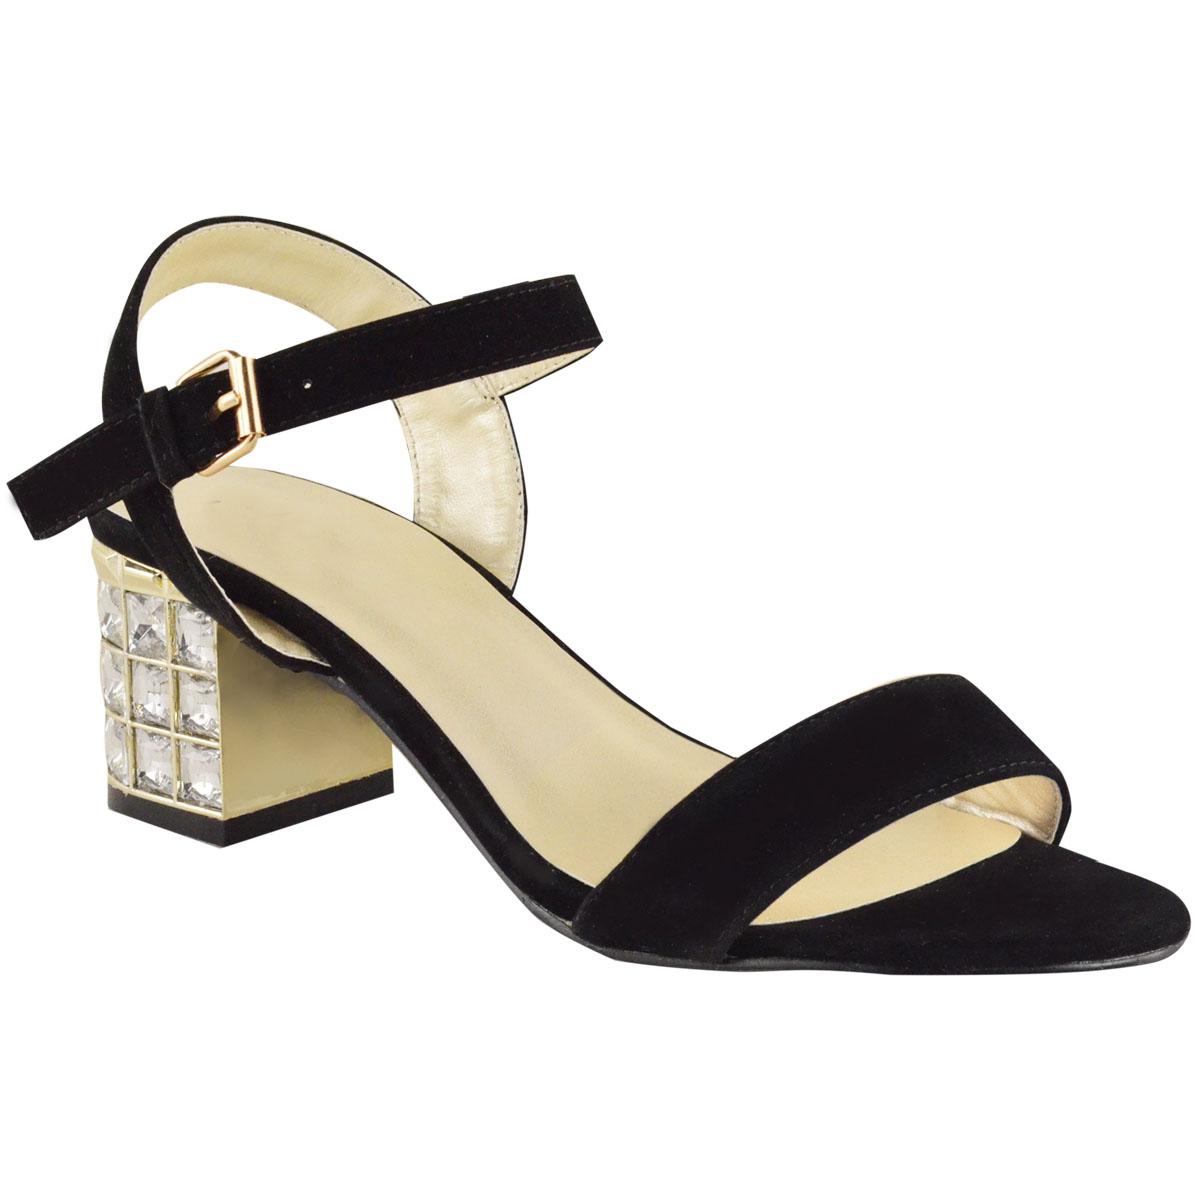 Black party sandals - Ladies Womens Diamante Sandals Low Heel Evening Ankle